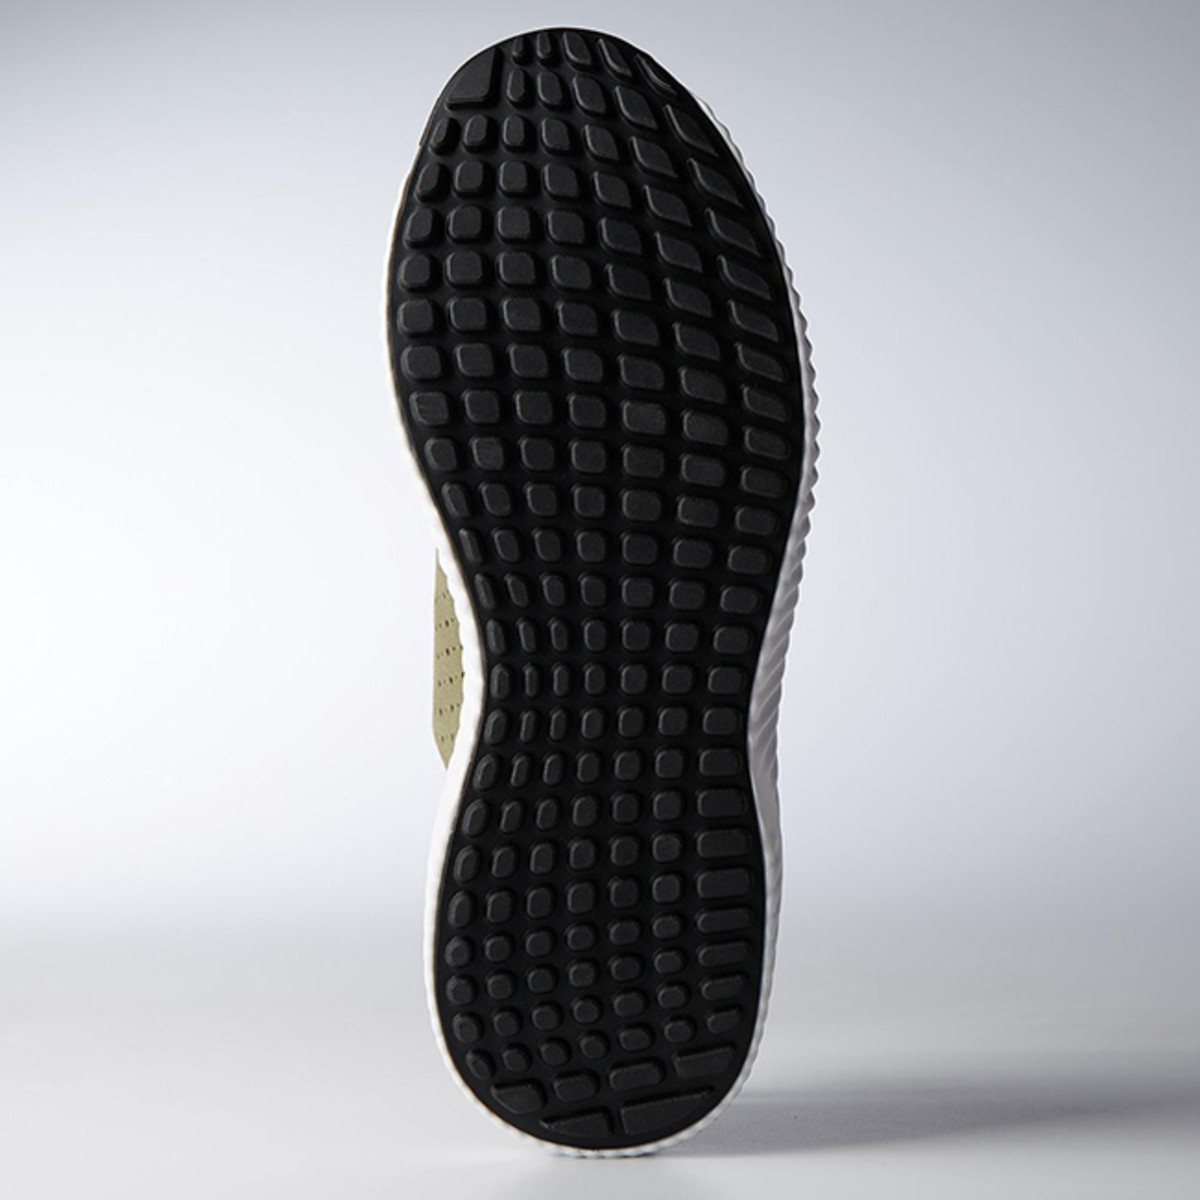 adicross Bounce golf shoes spikeless outsole/bottom